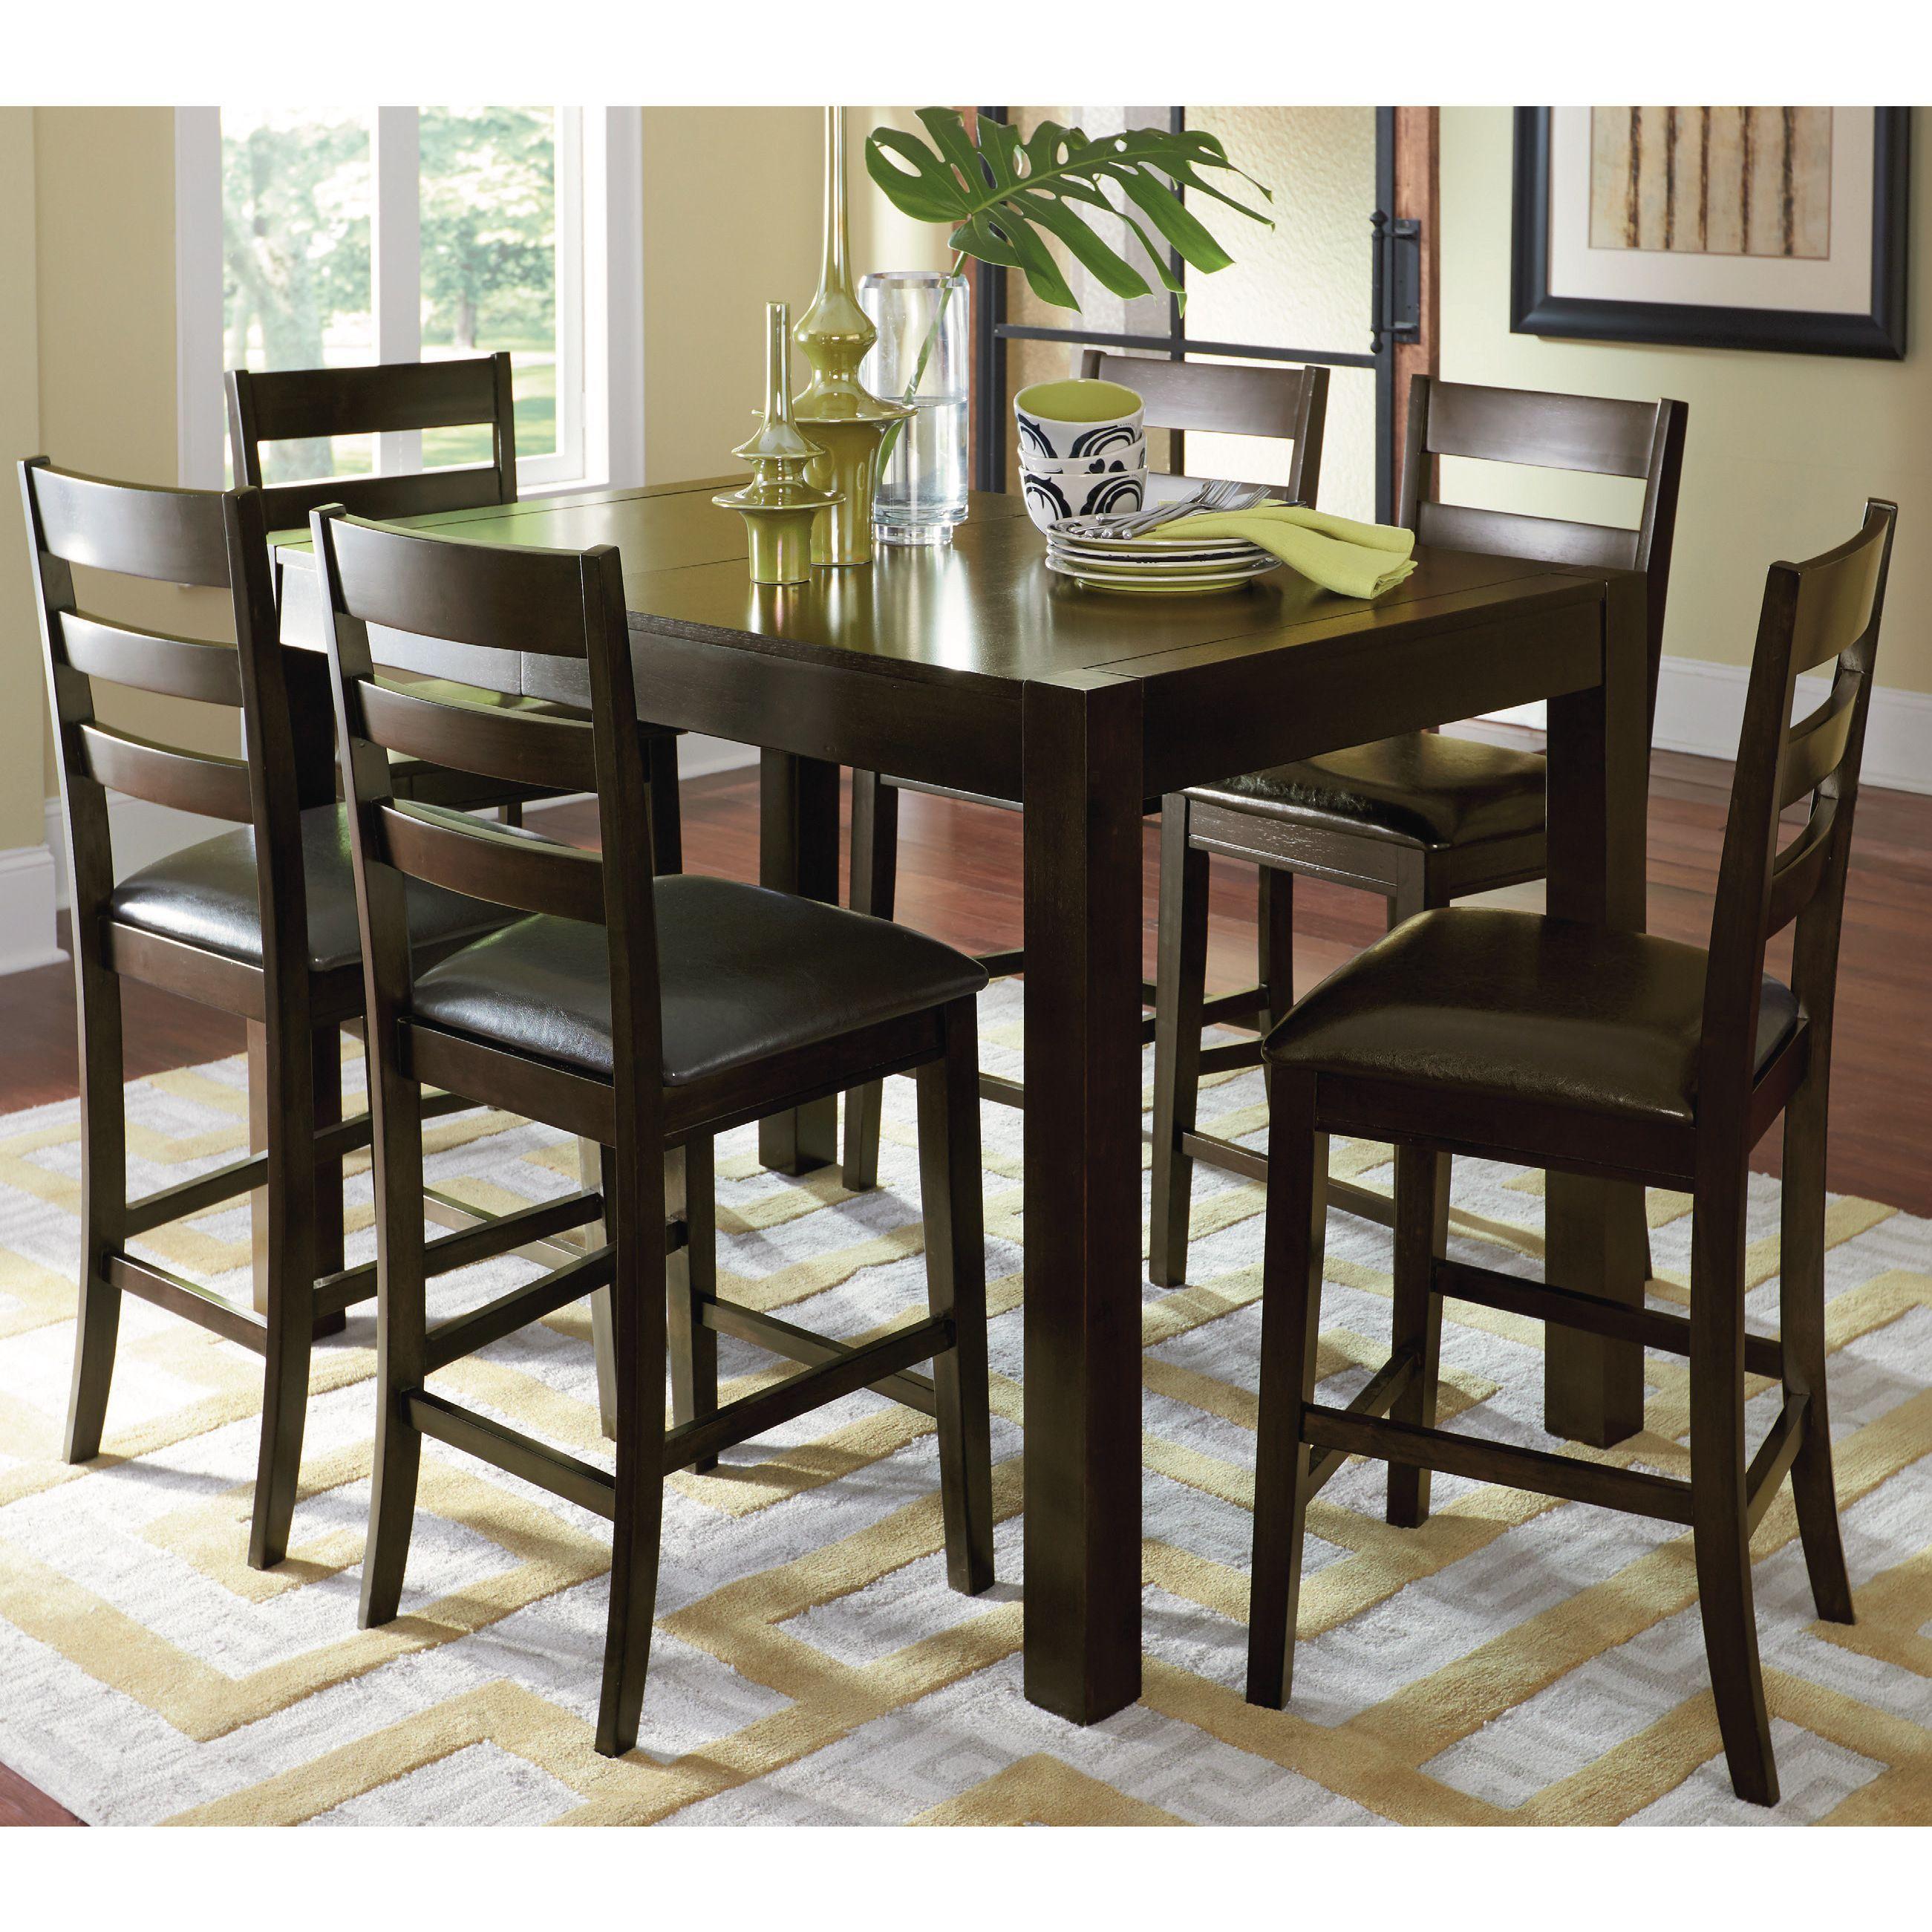 Progressive amini espresso brown veneer rubberwood butterfly counter table counter height